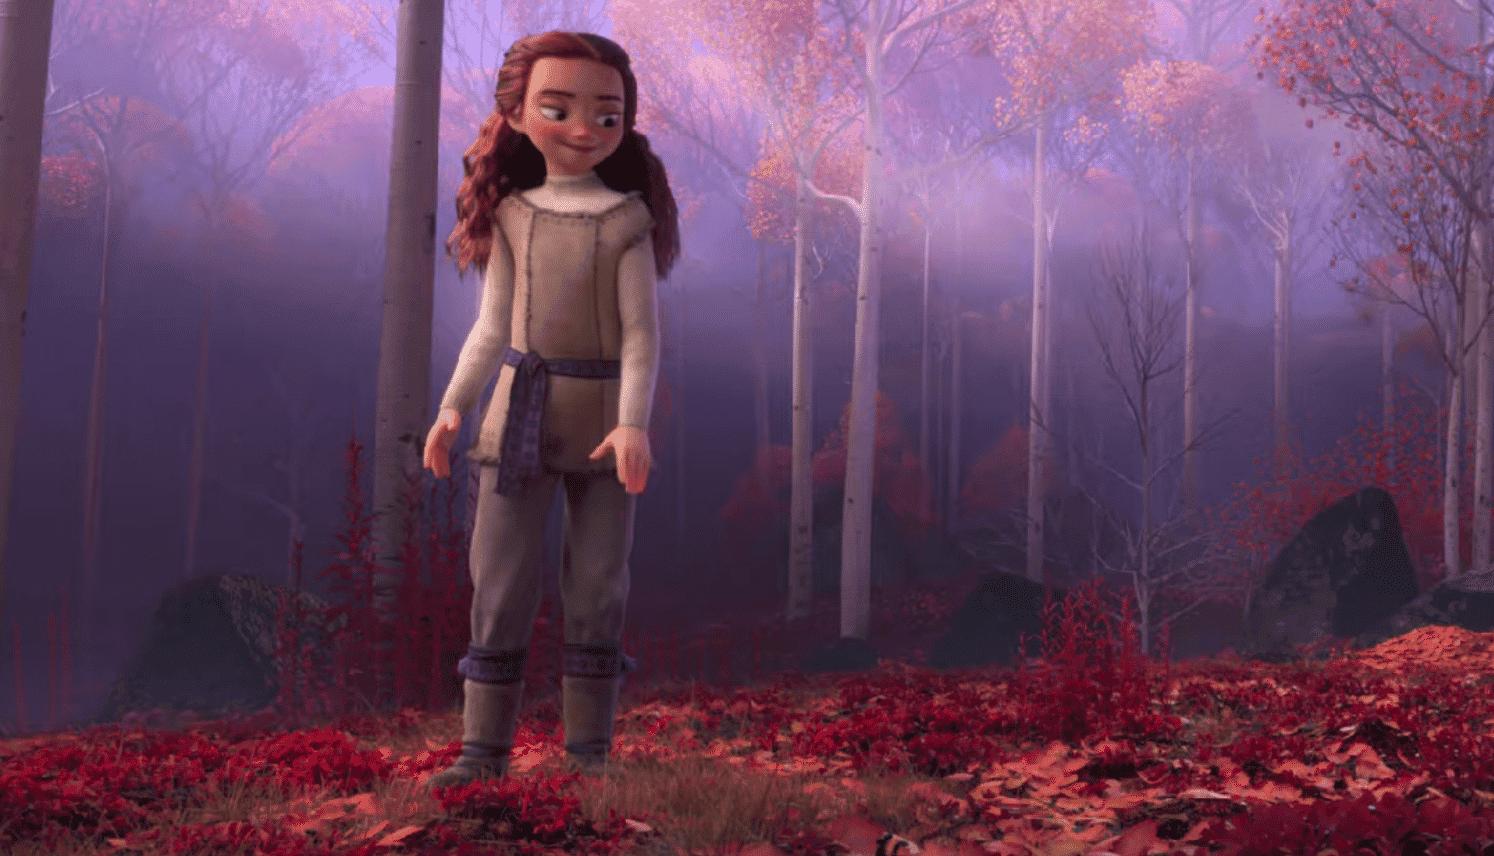 Posible novia de Elsa en Frozen 2